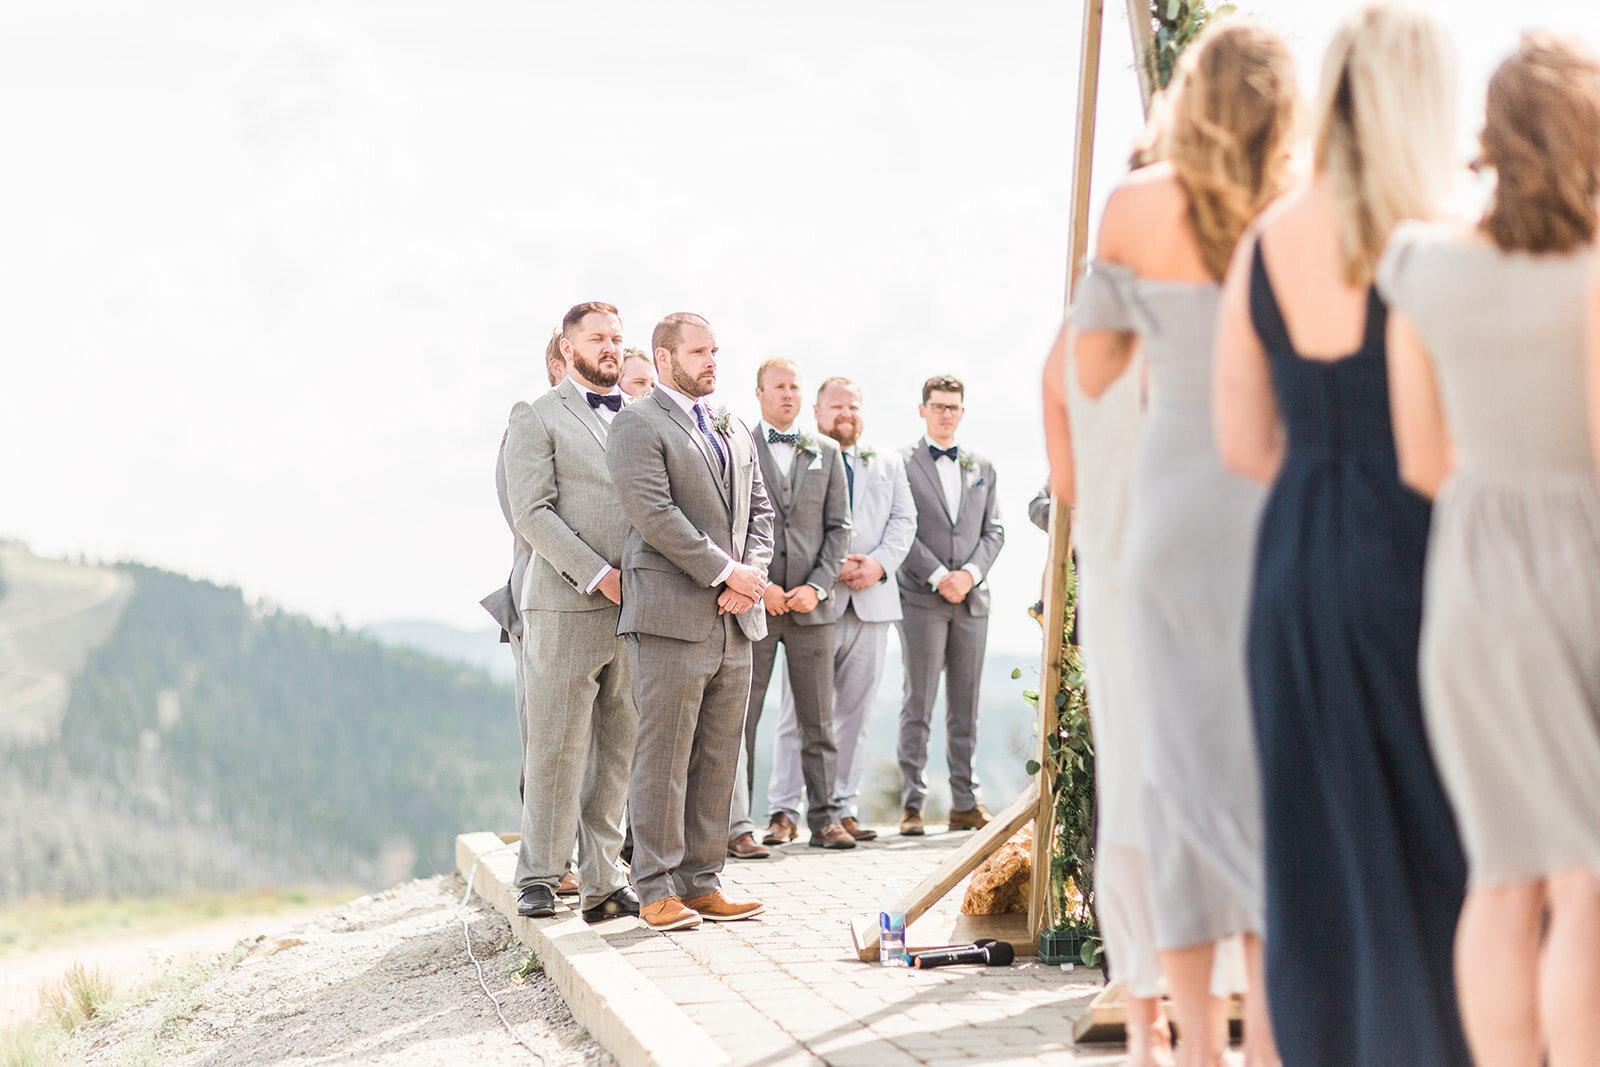 bridesmaids and groomsmen looking on spokane wedding ceremony